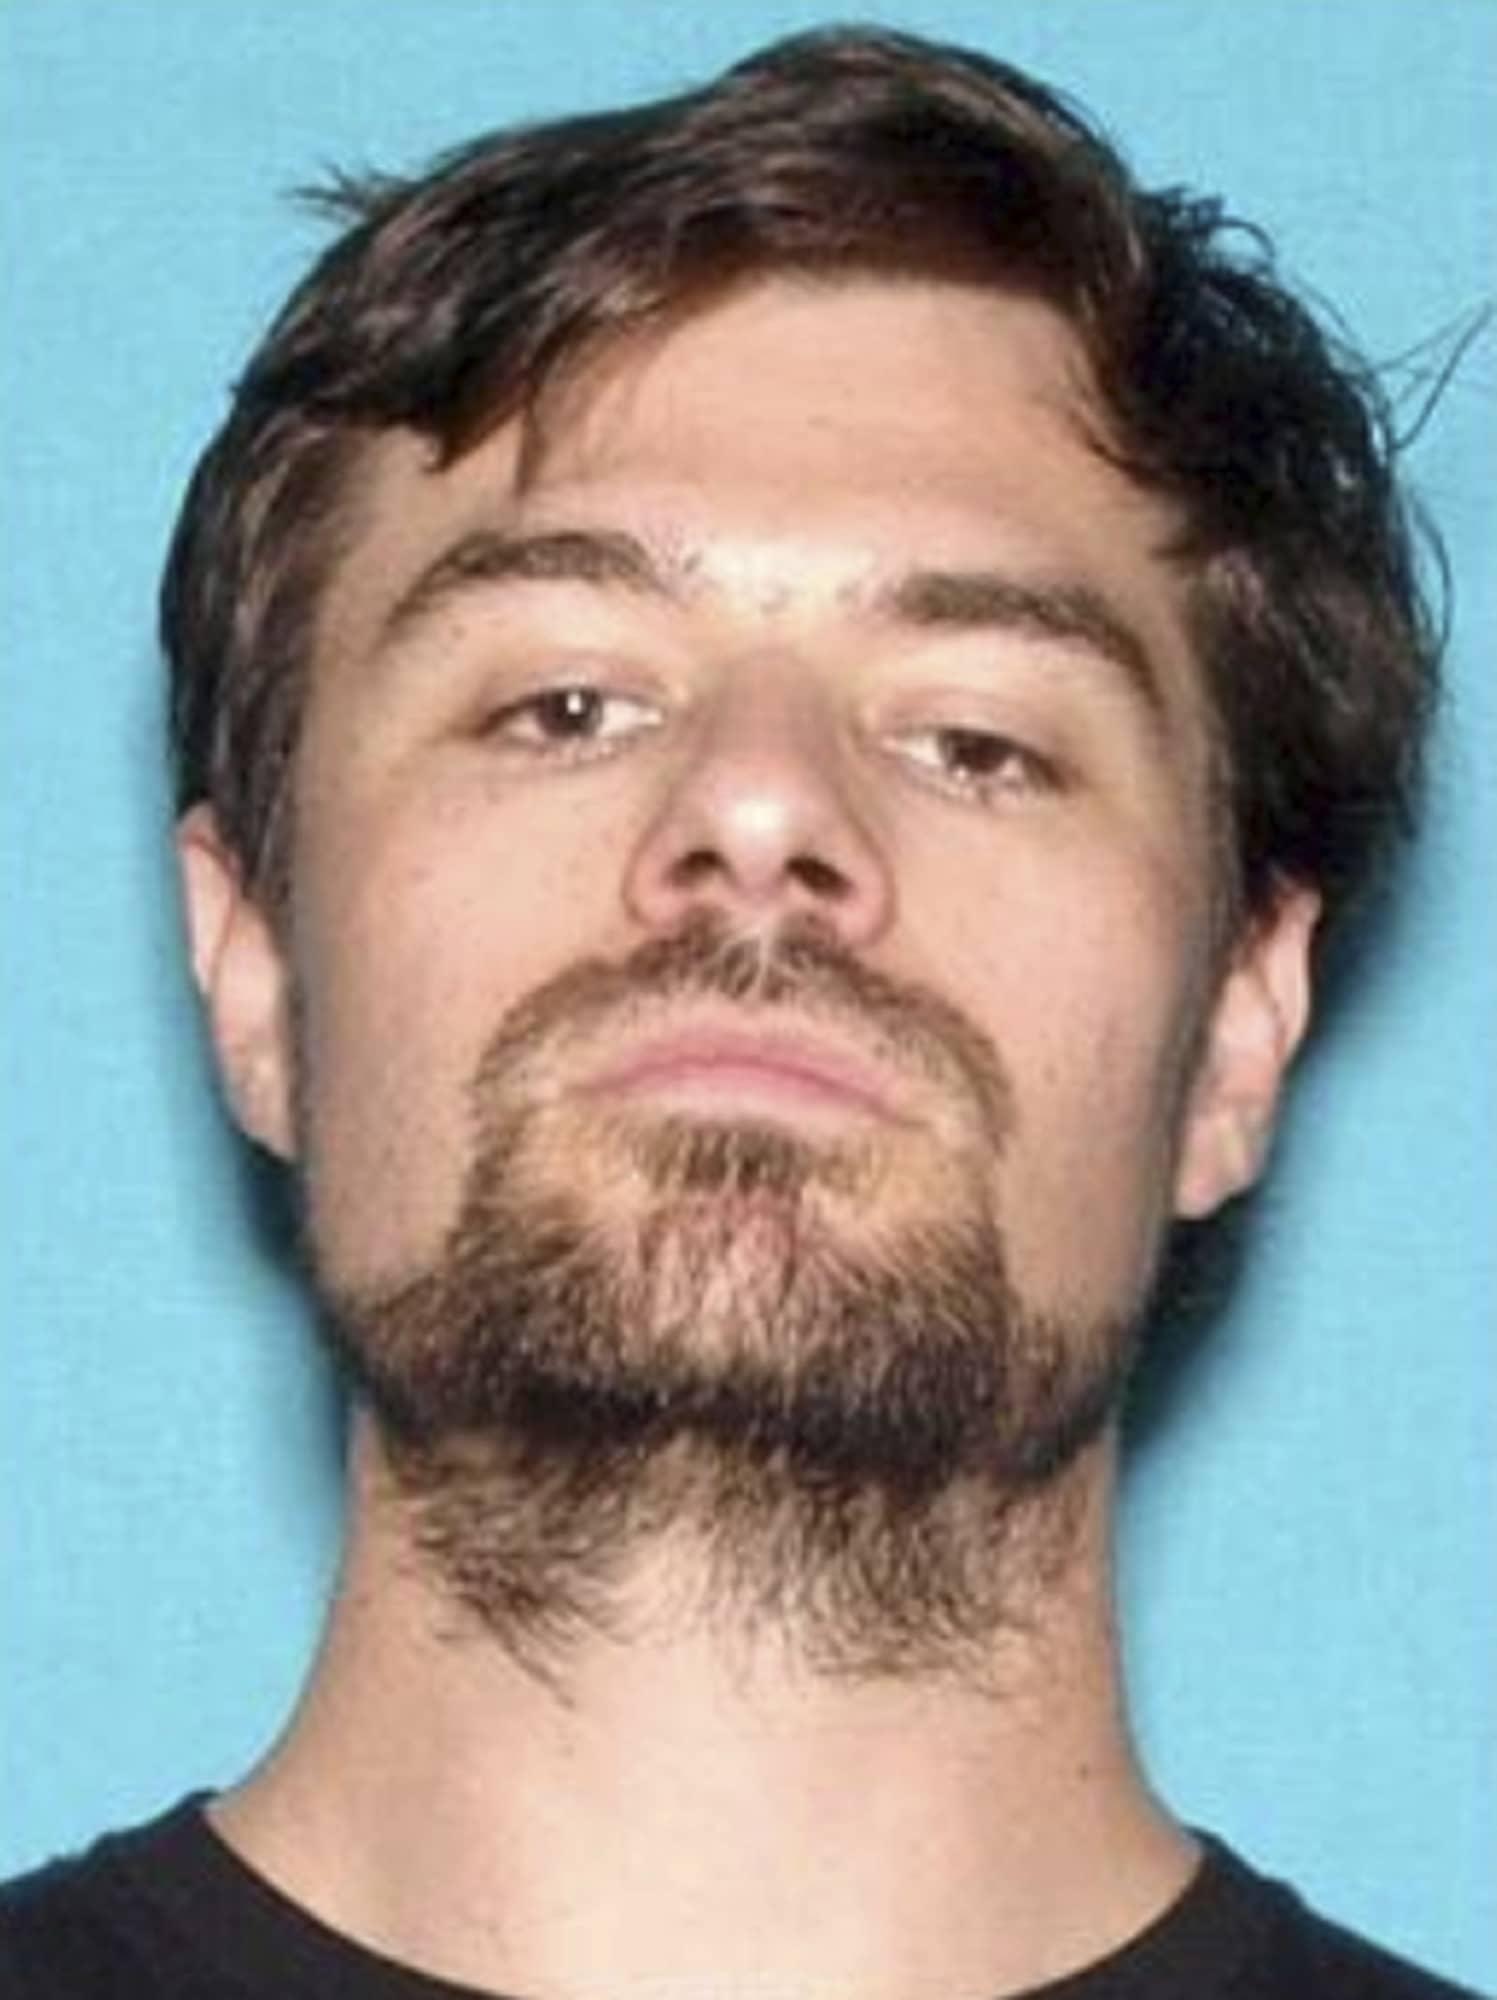 Photo of gunman Ian David Long